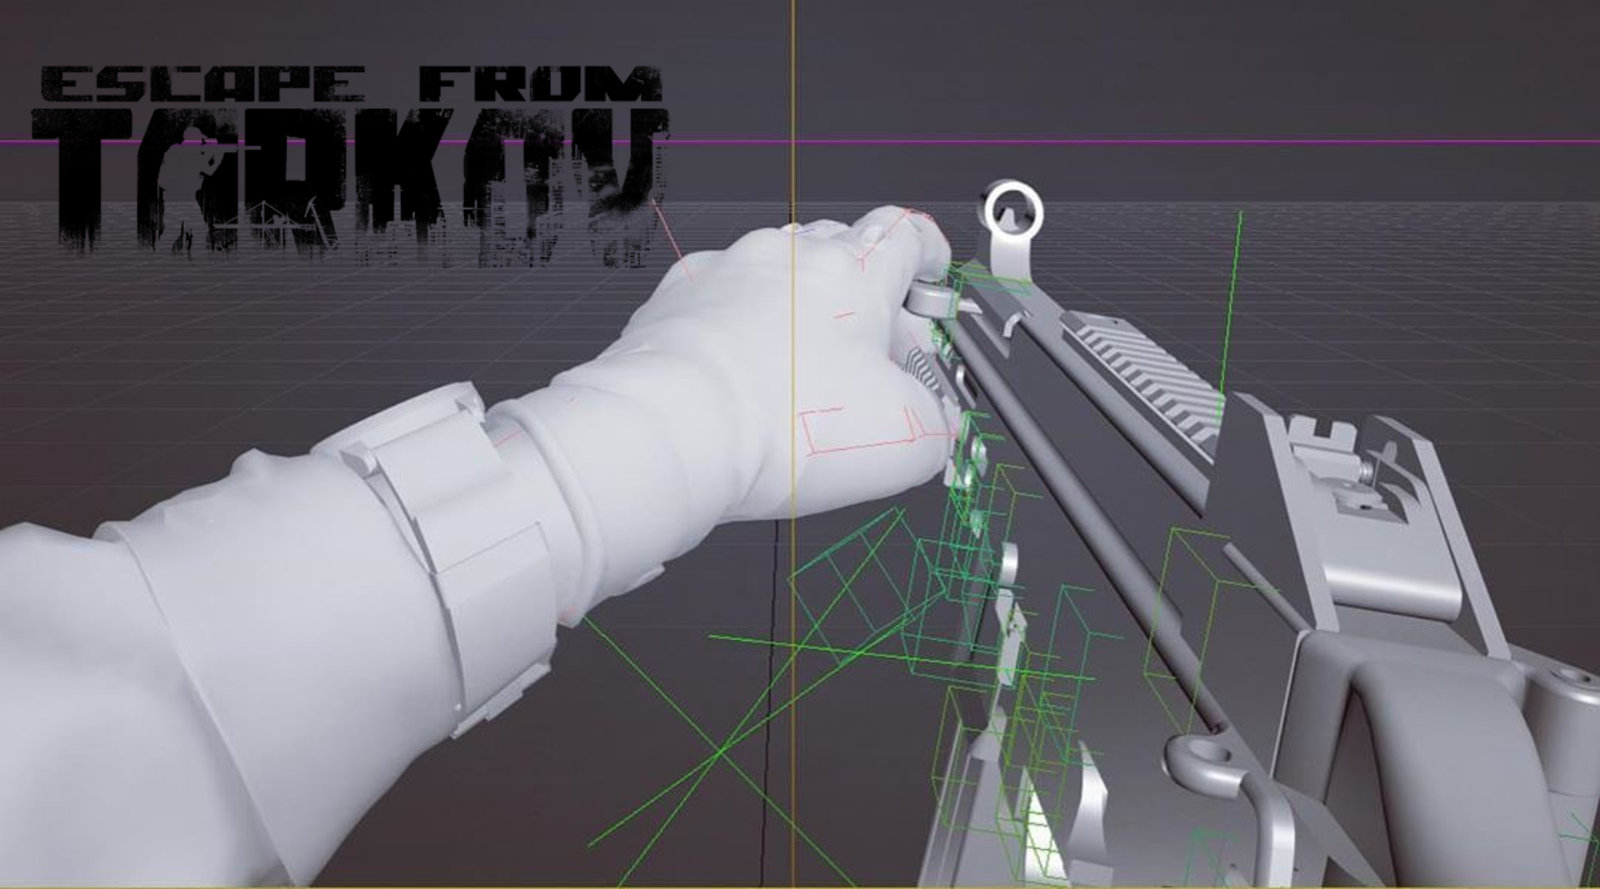 tarkov-weapons